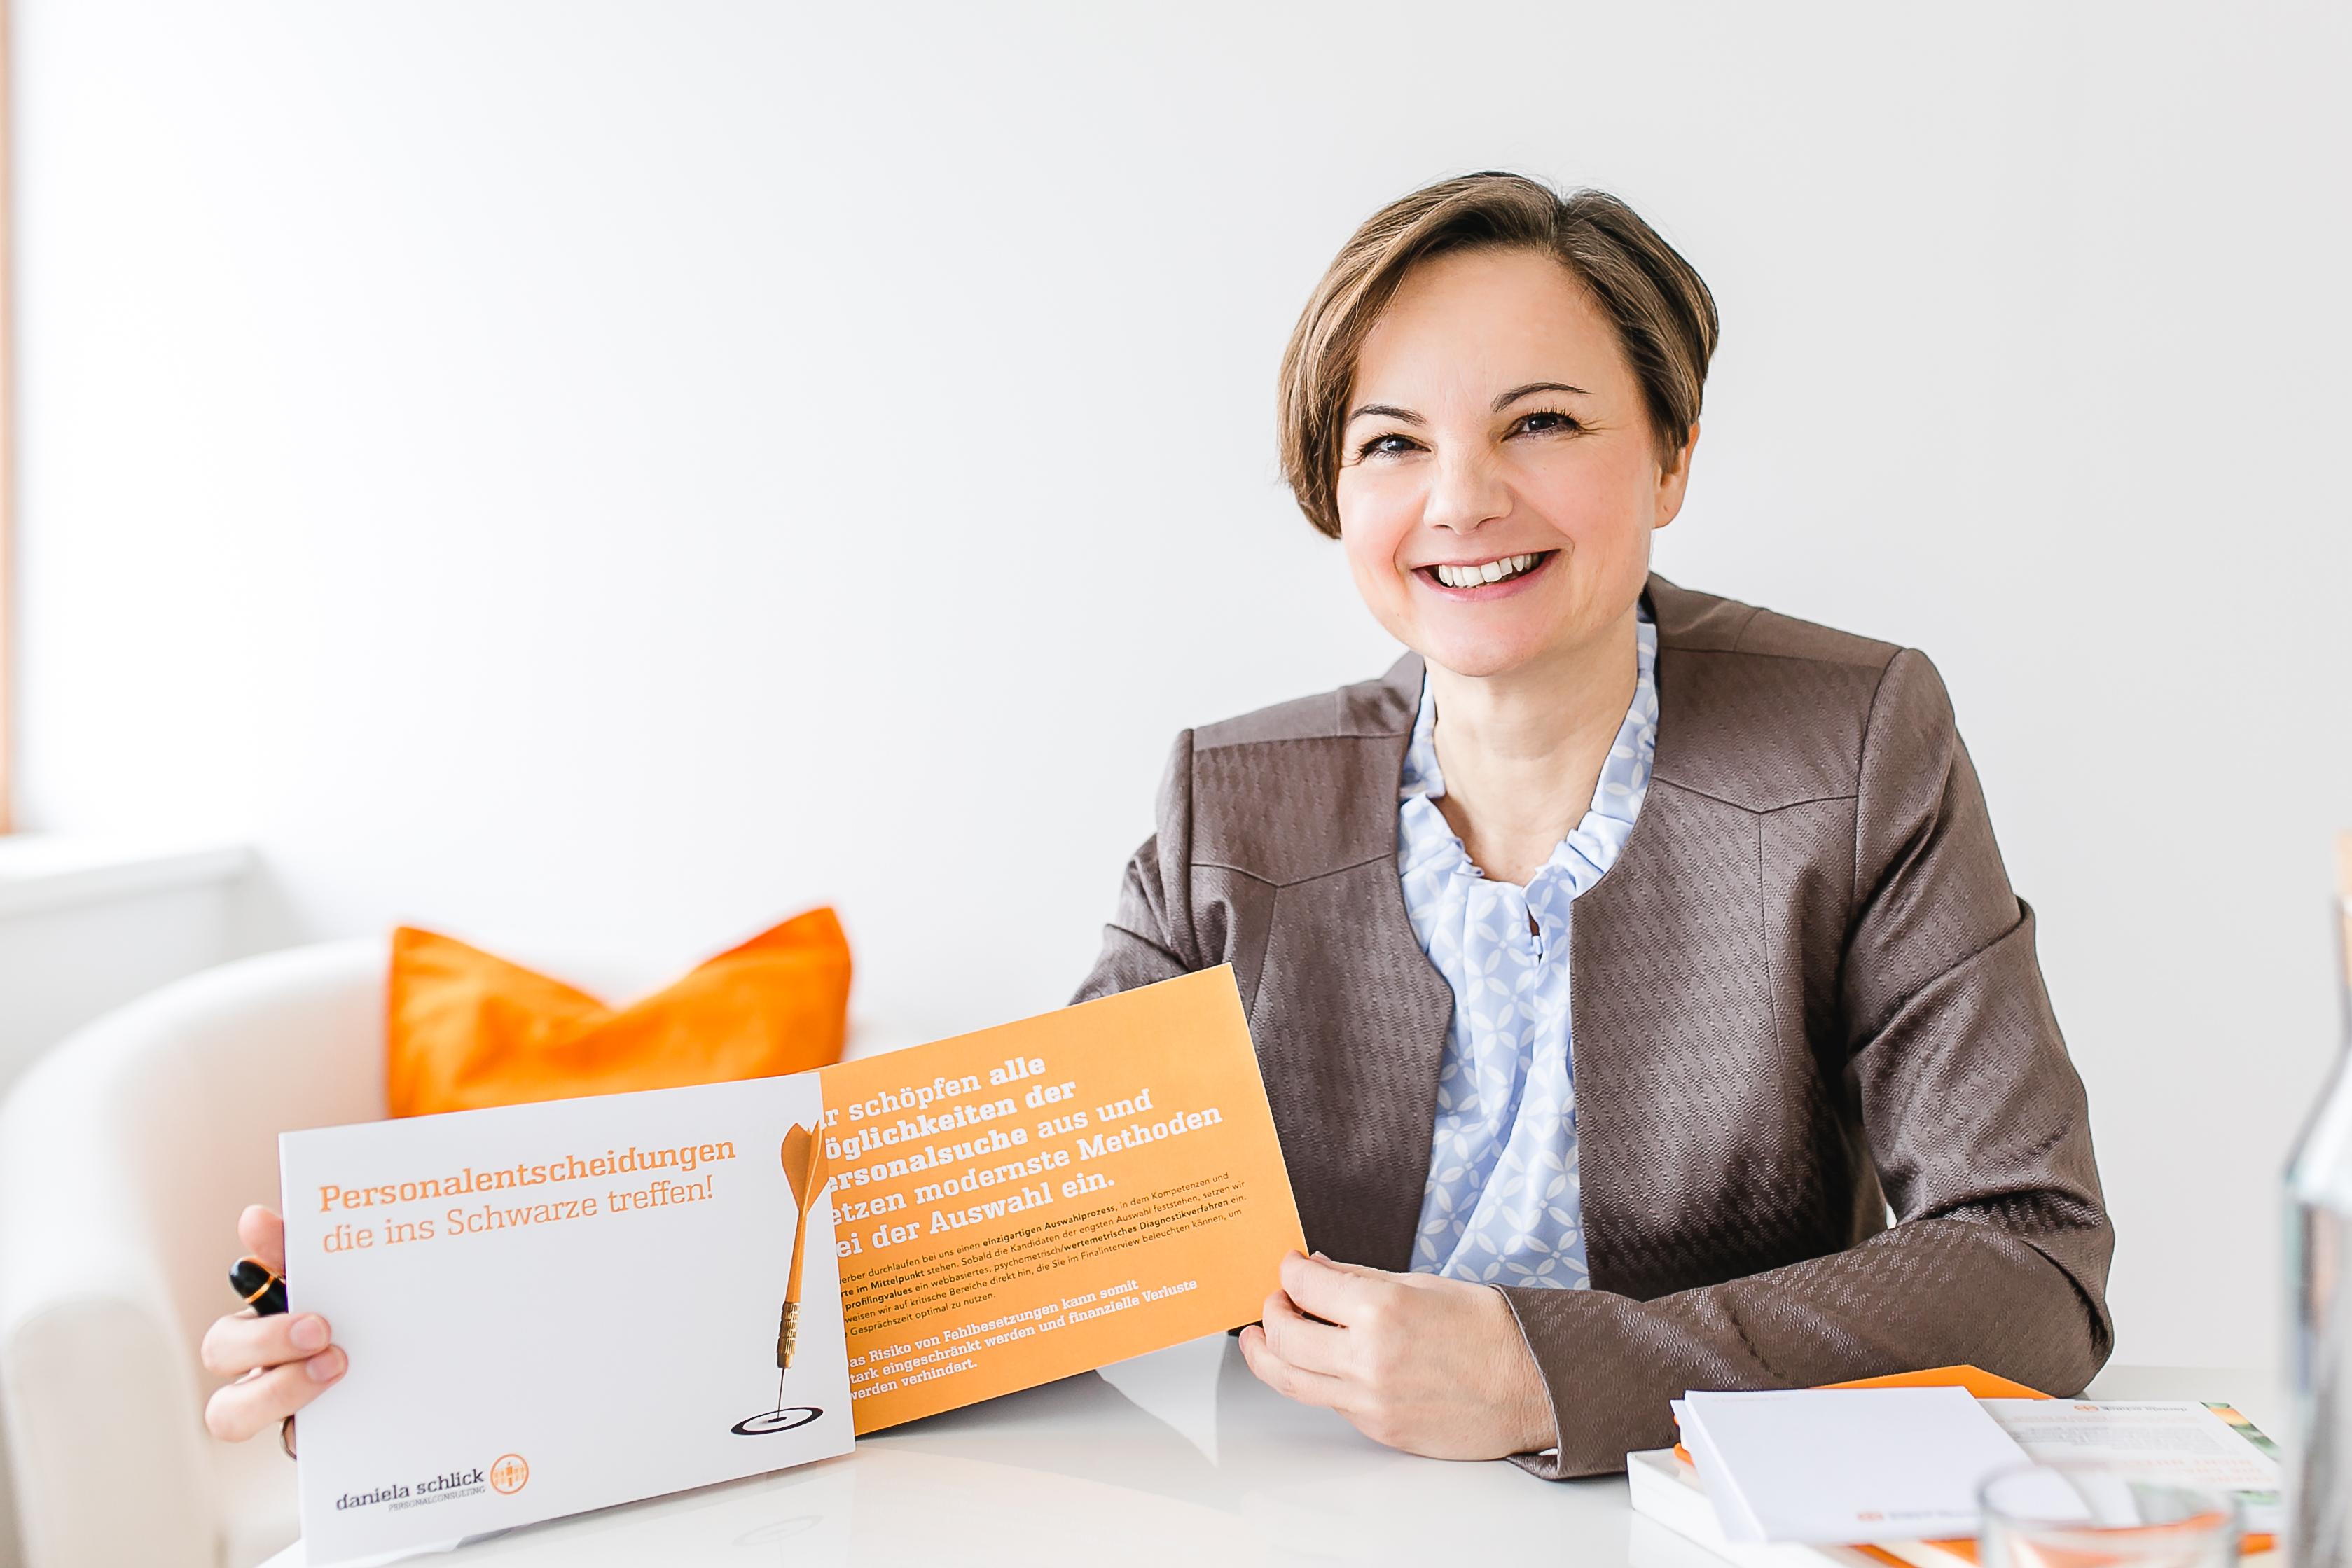 Daniela Schlick